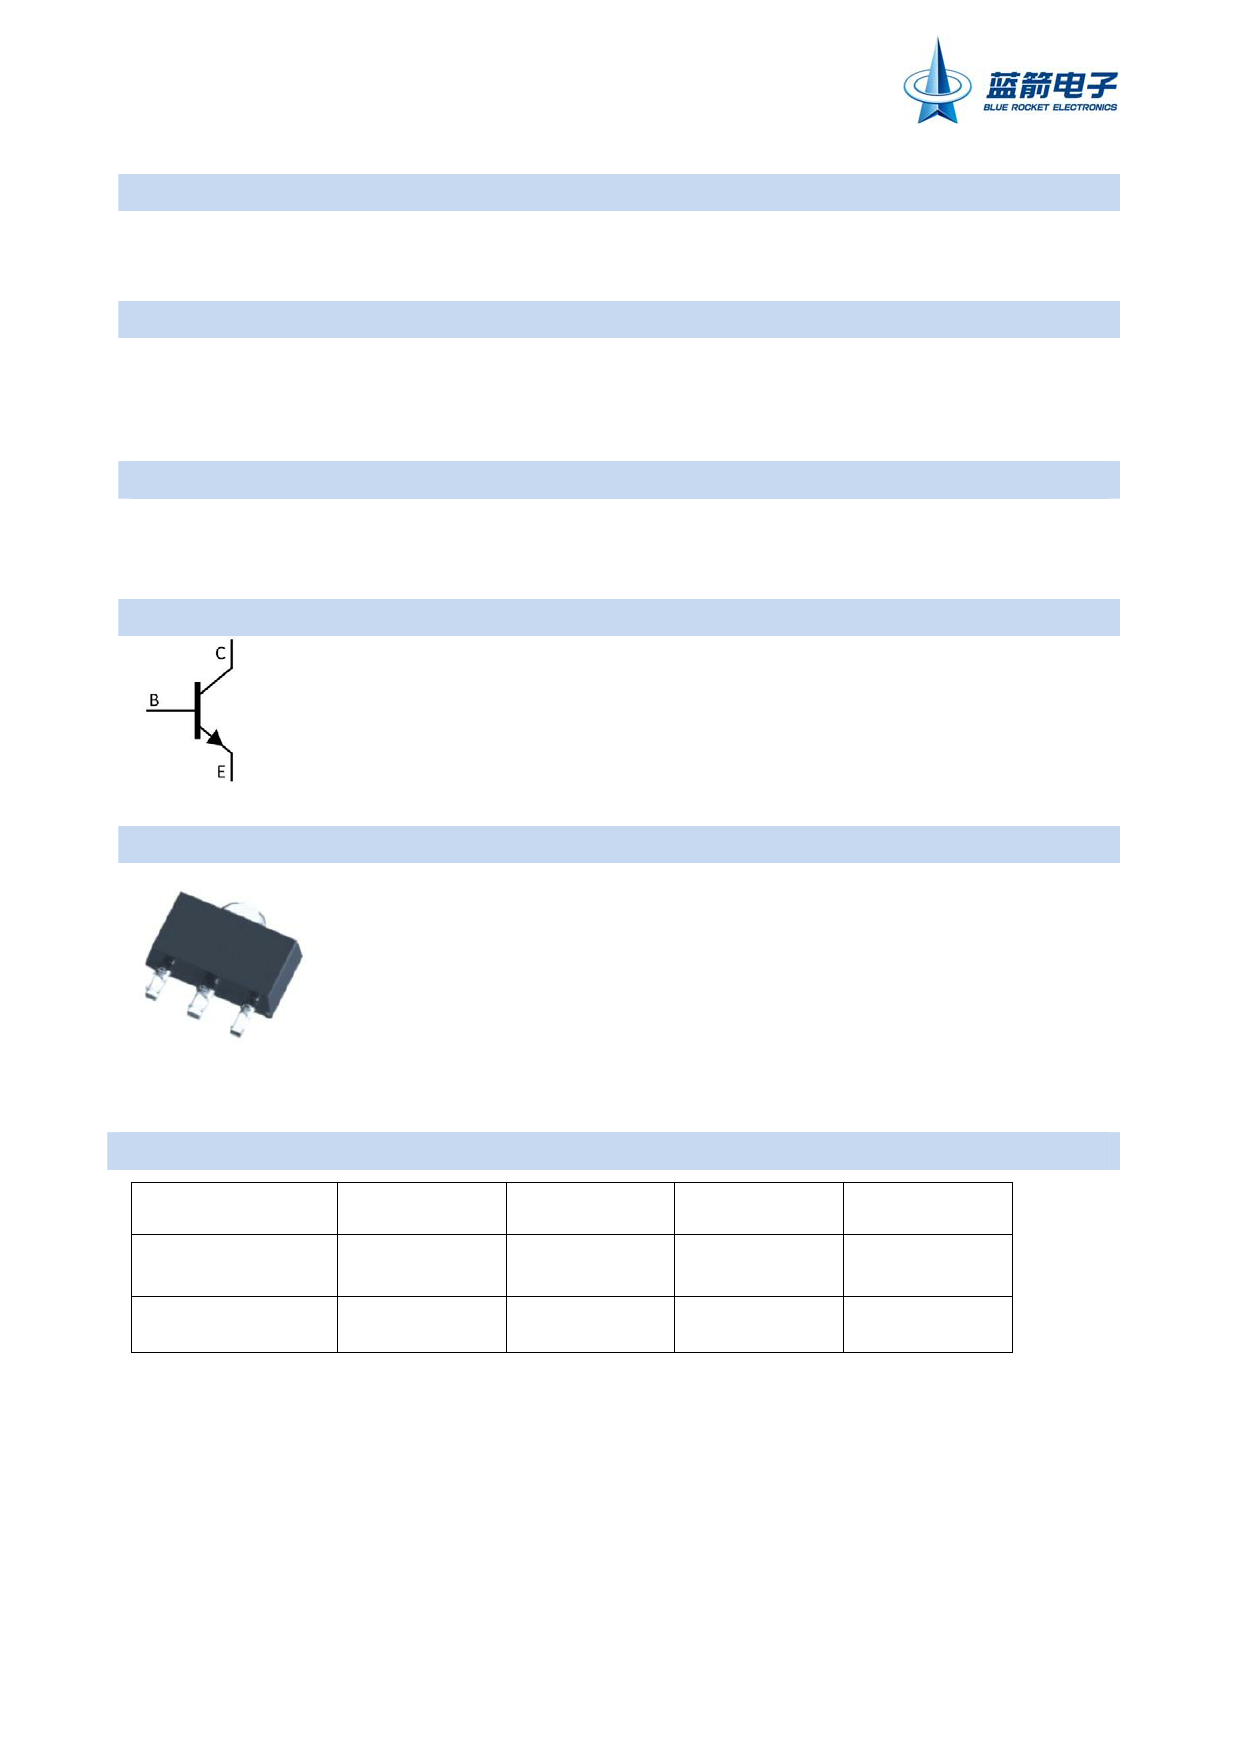 9014T datasheet